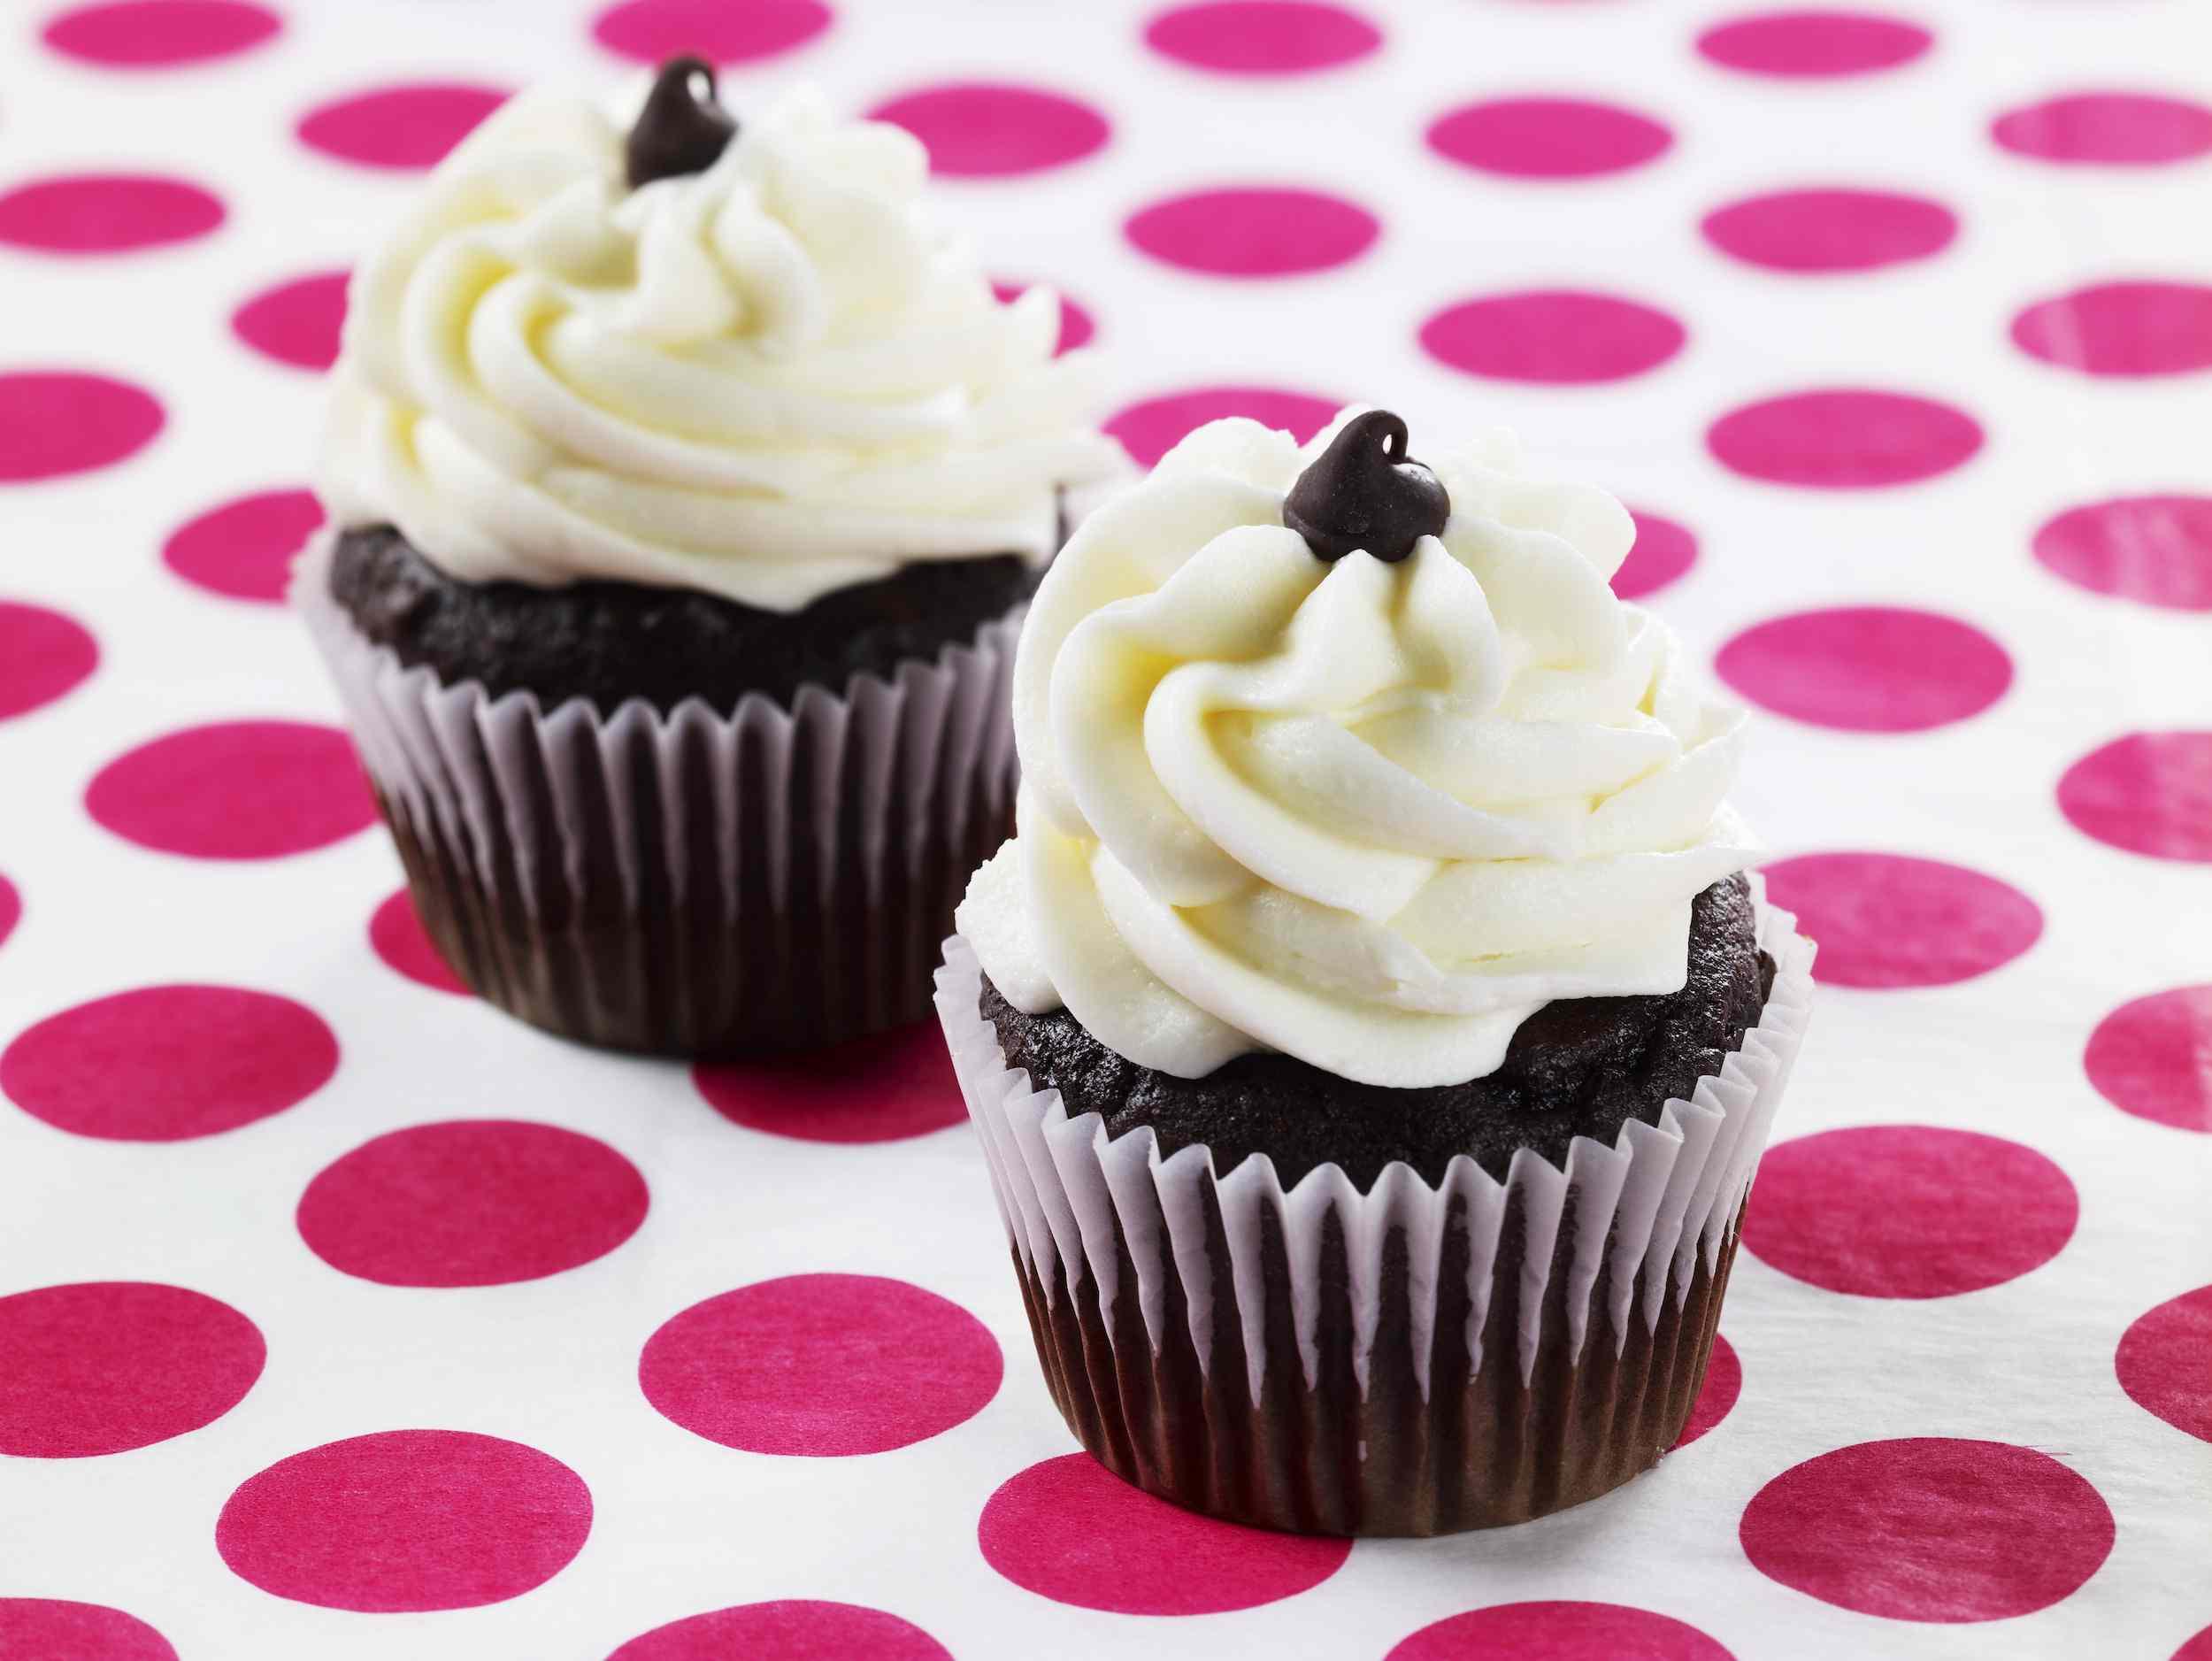 baileys-chocolate-cupcakes-2000